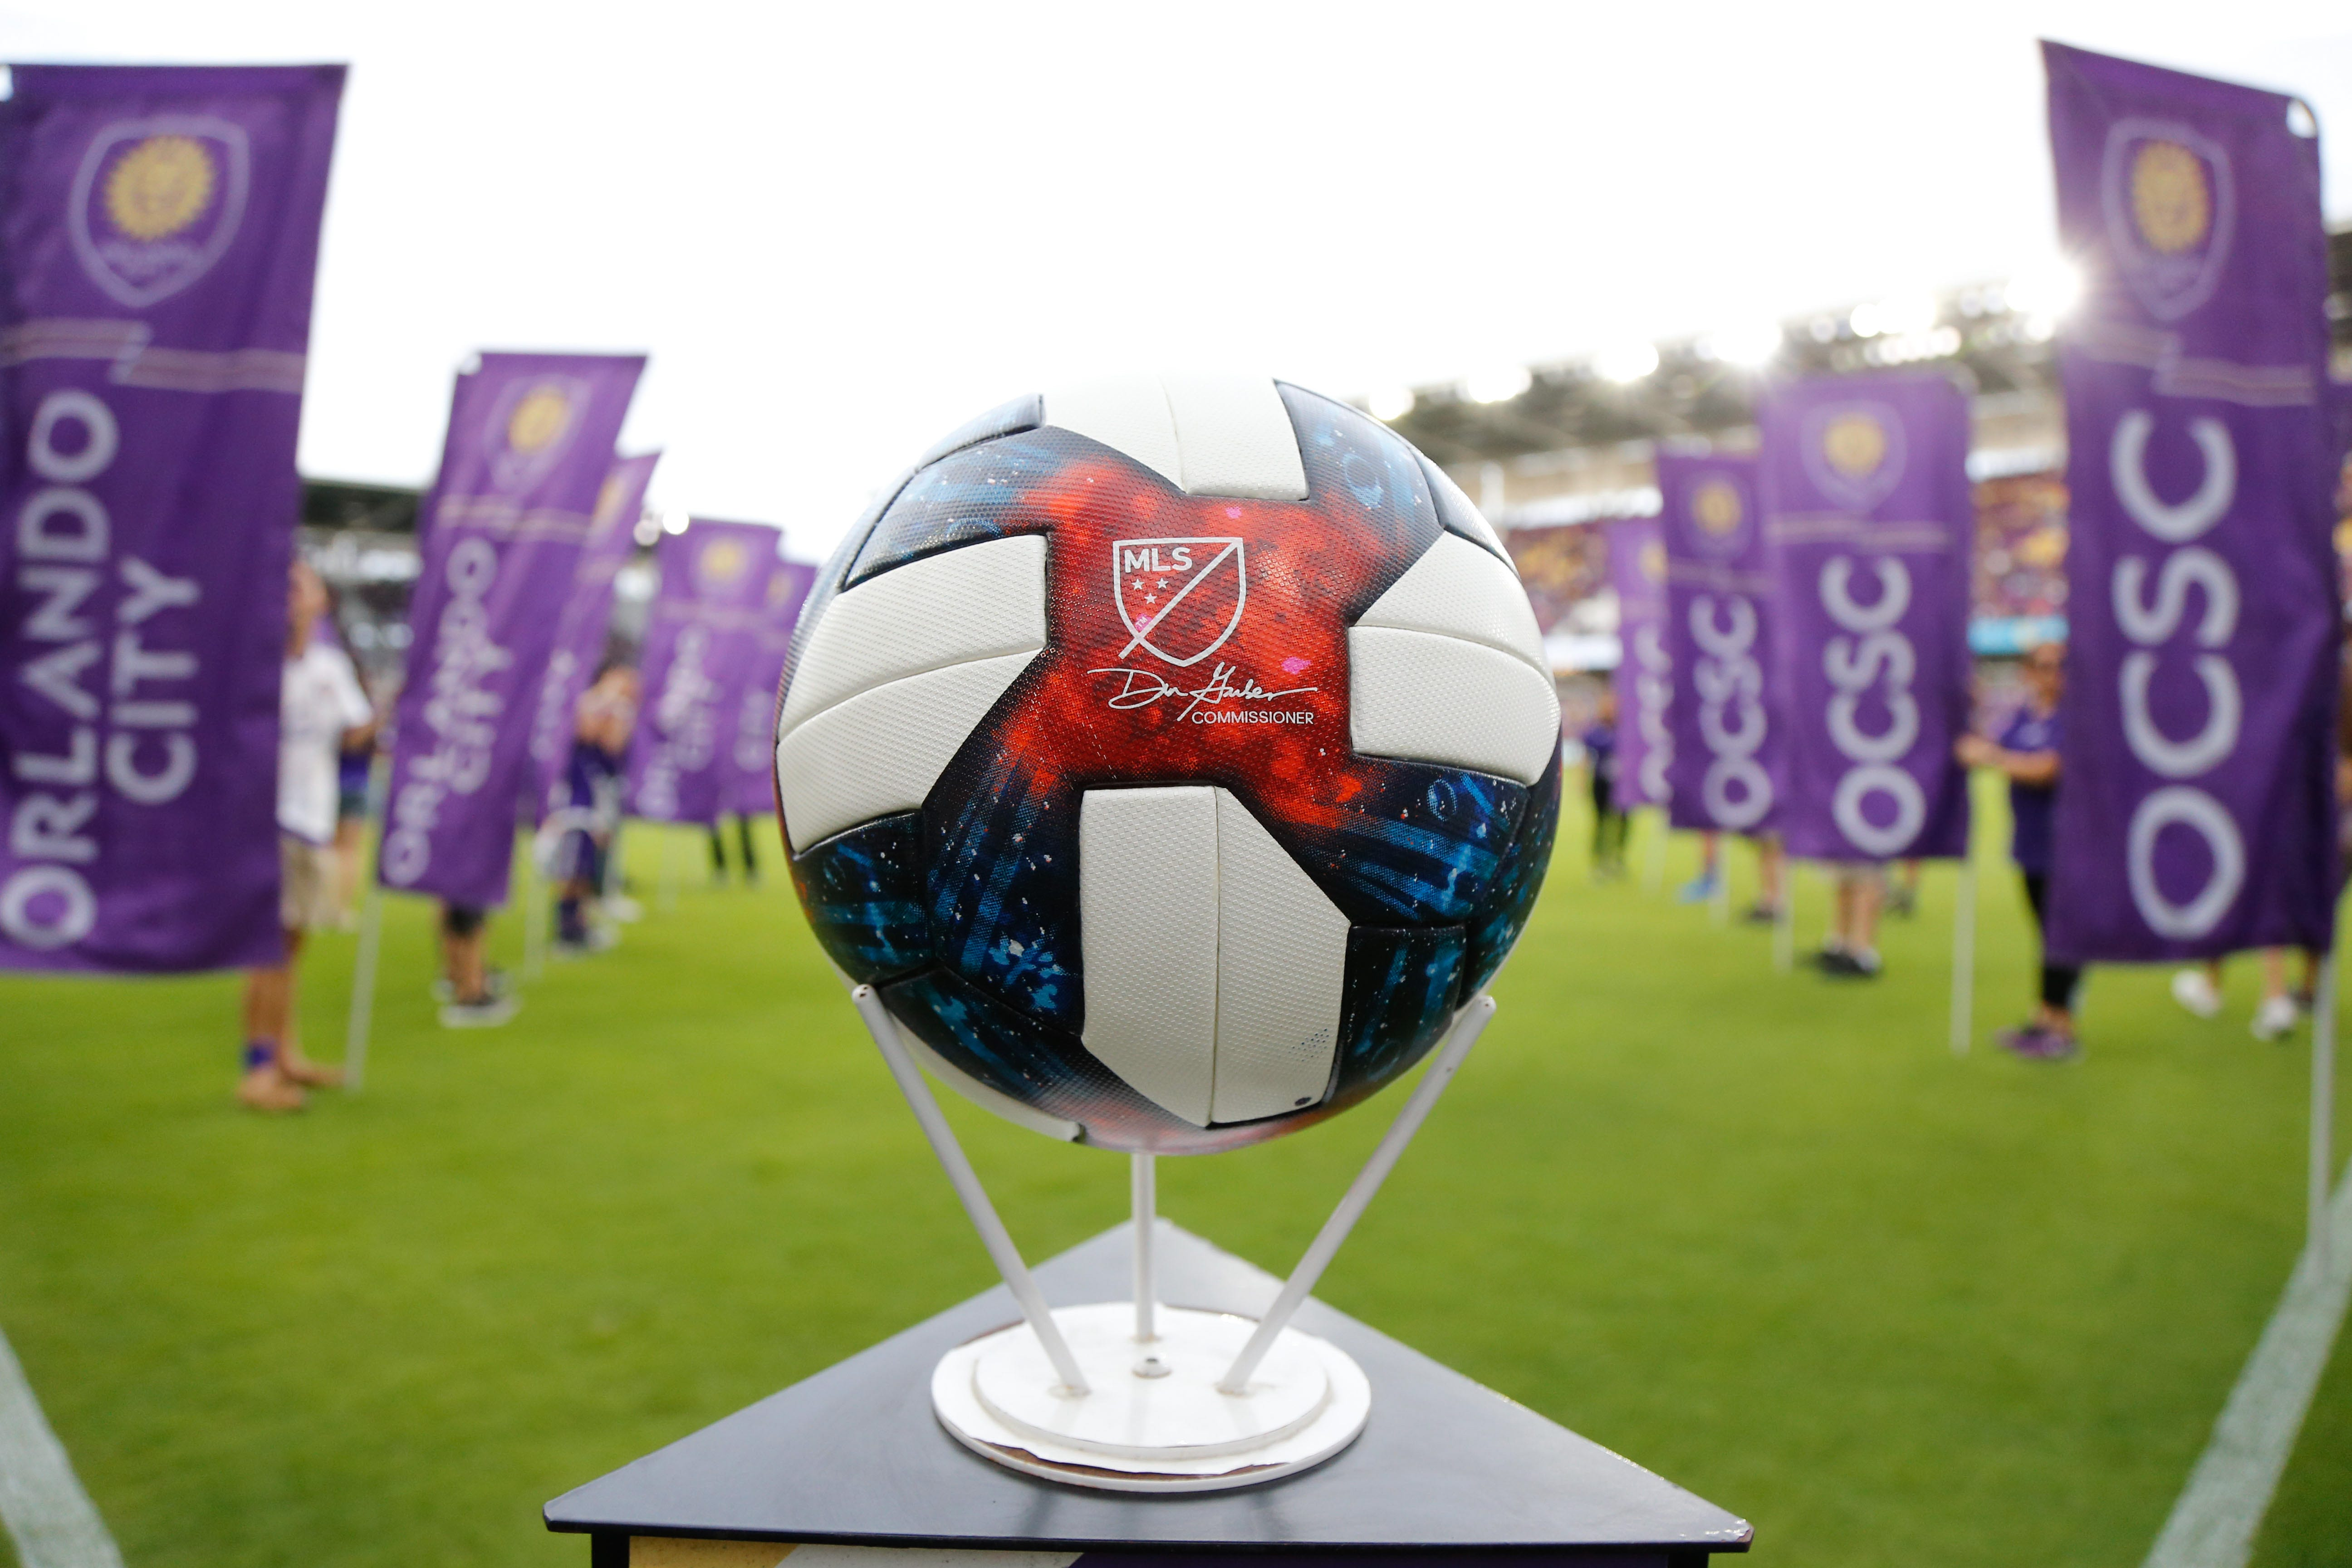 Orlando City Stadium will host the 2019 MLS All-Star Game.